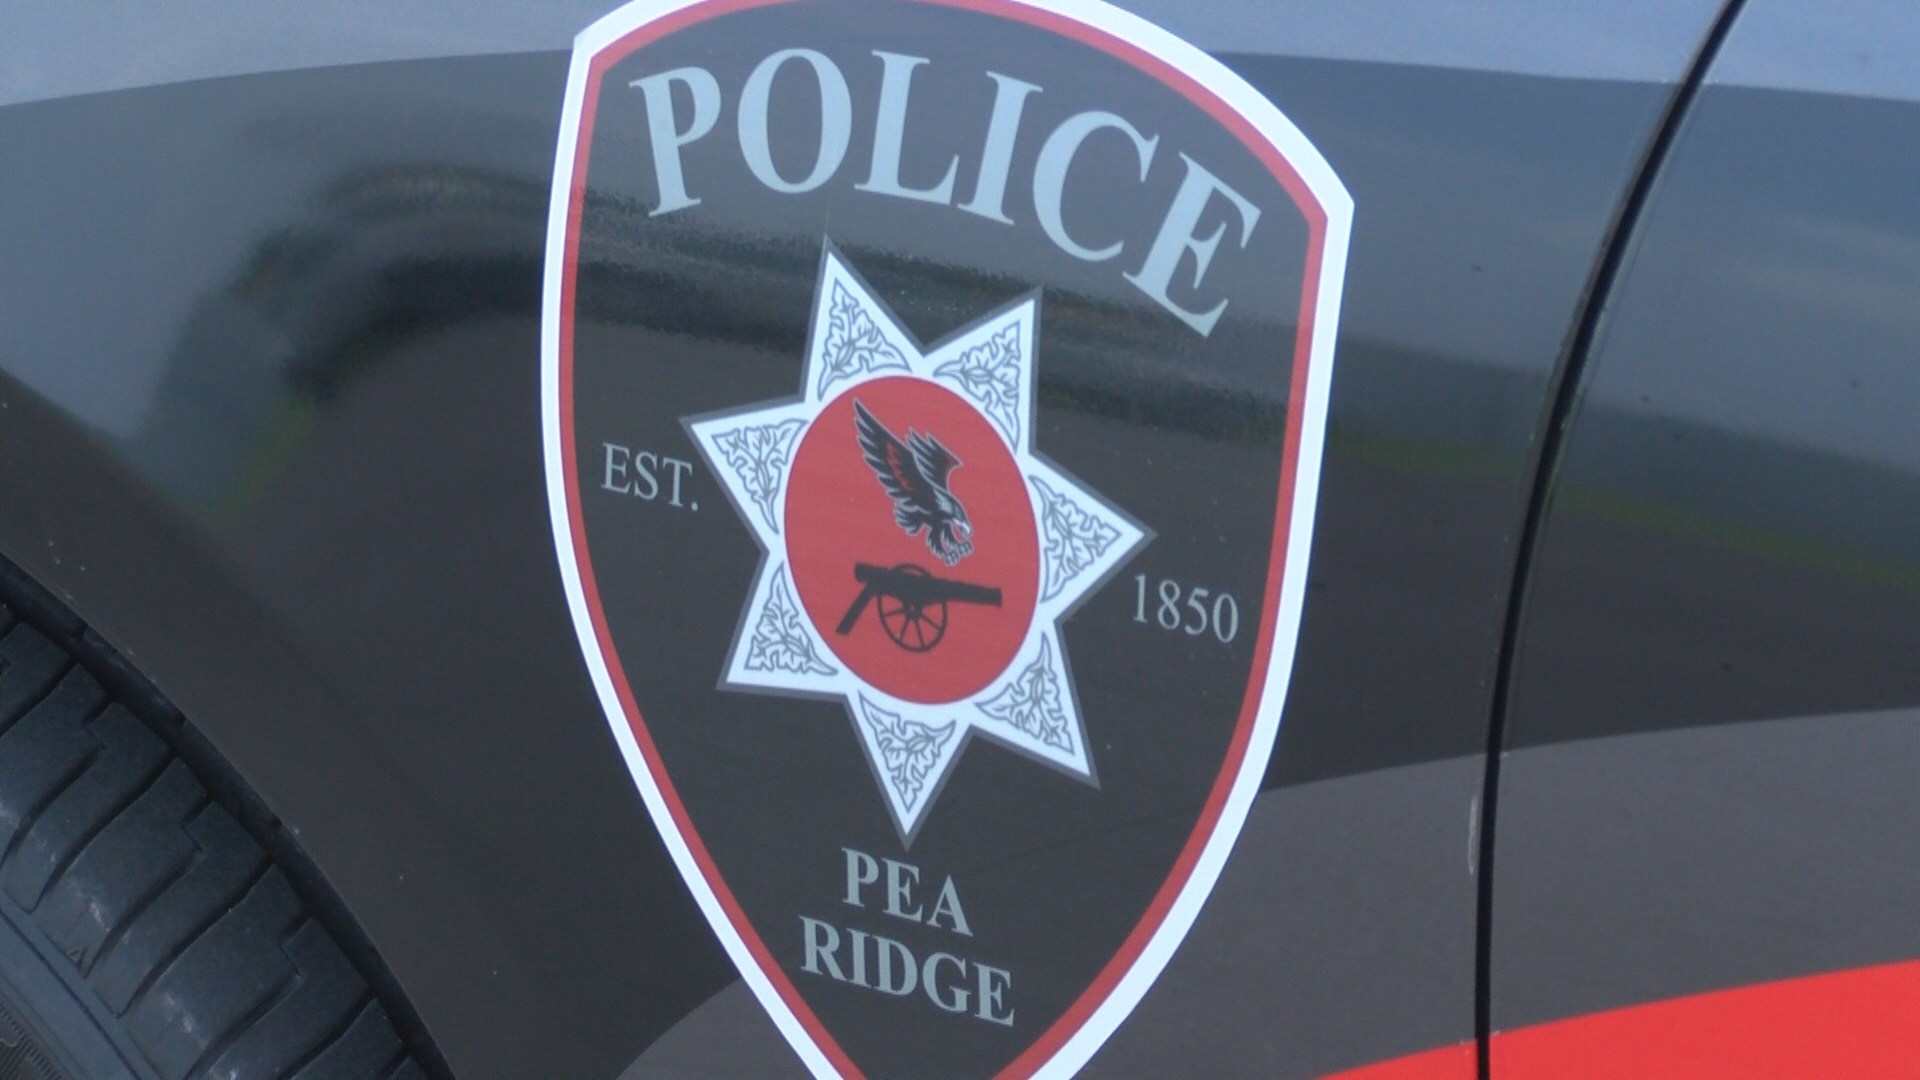 PEA RIDGE POLICE GRANT 1_1534989808169.jpg.jpg